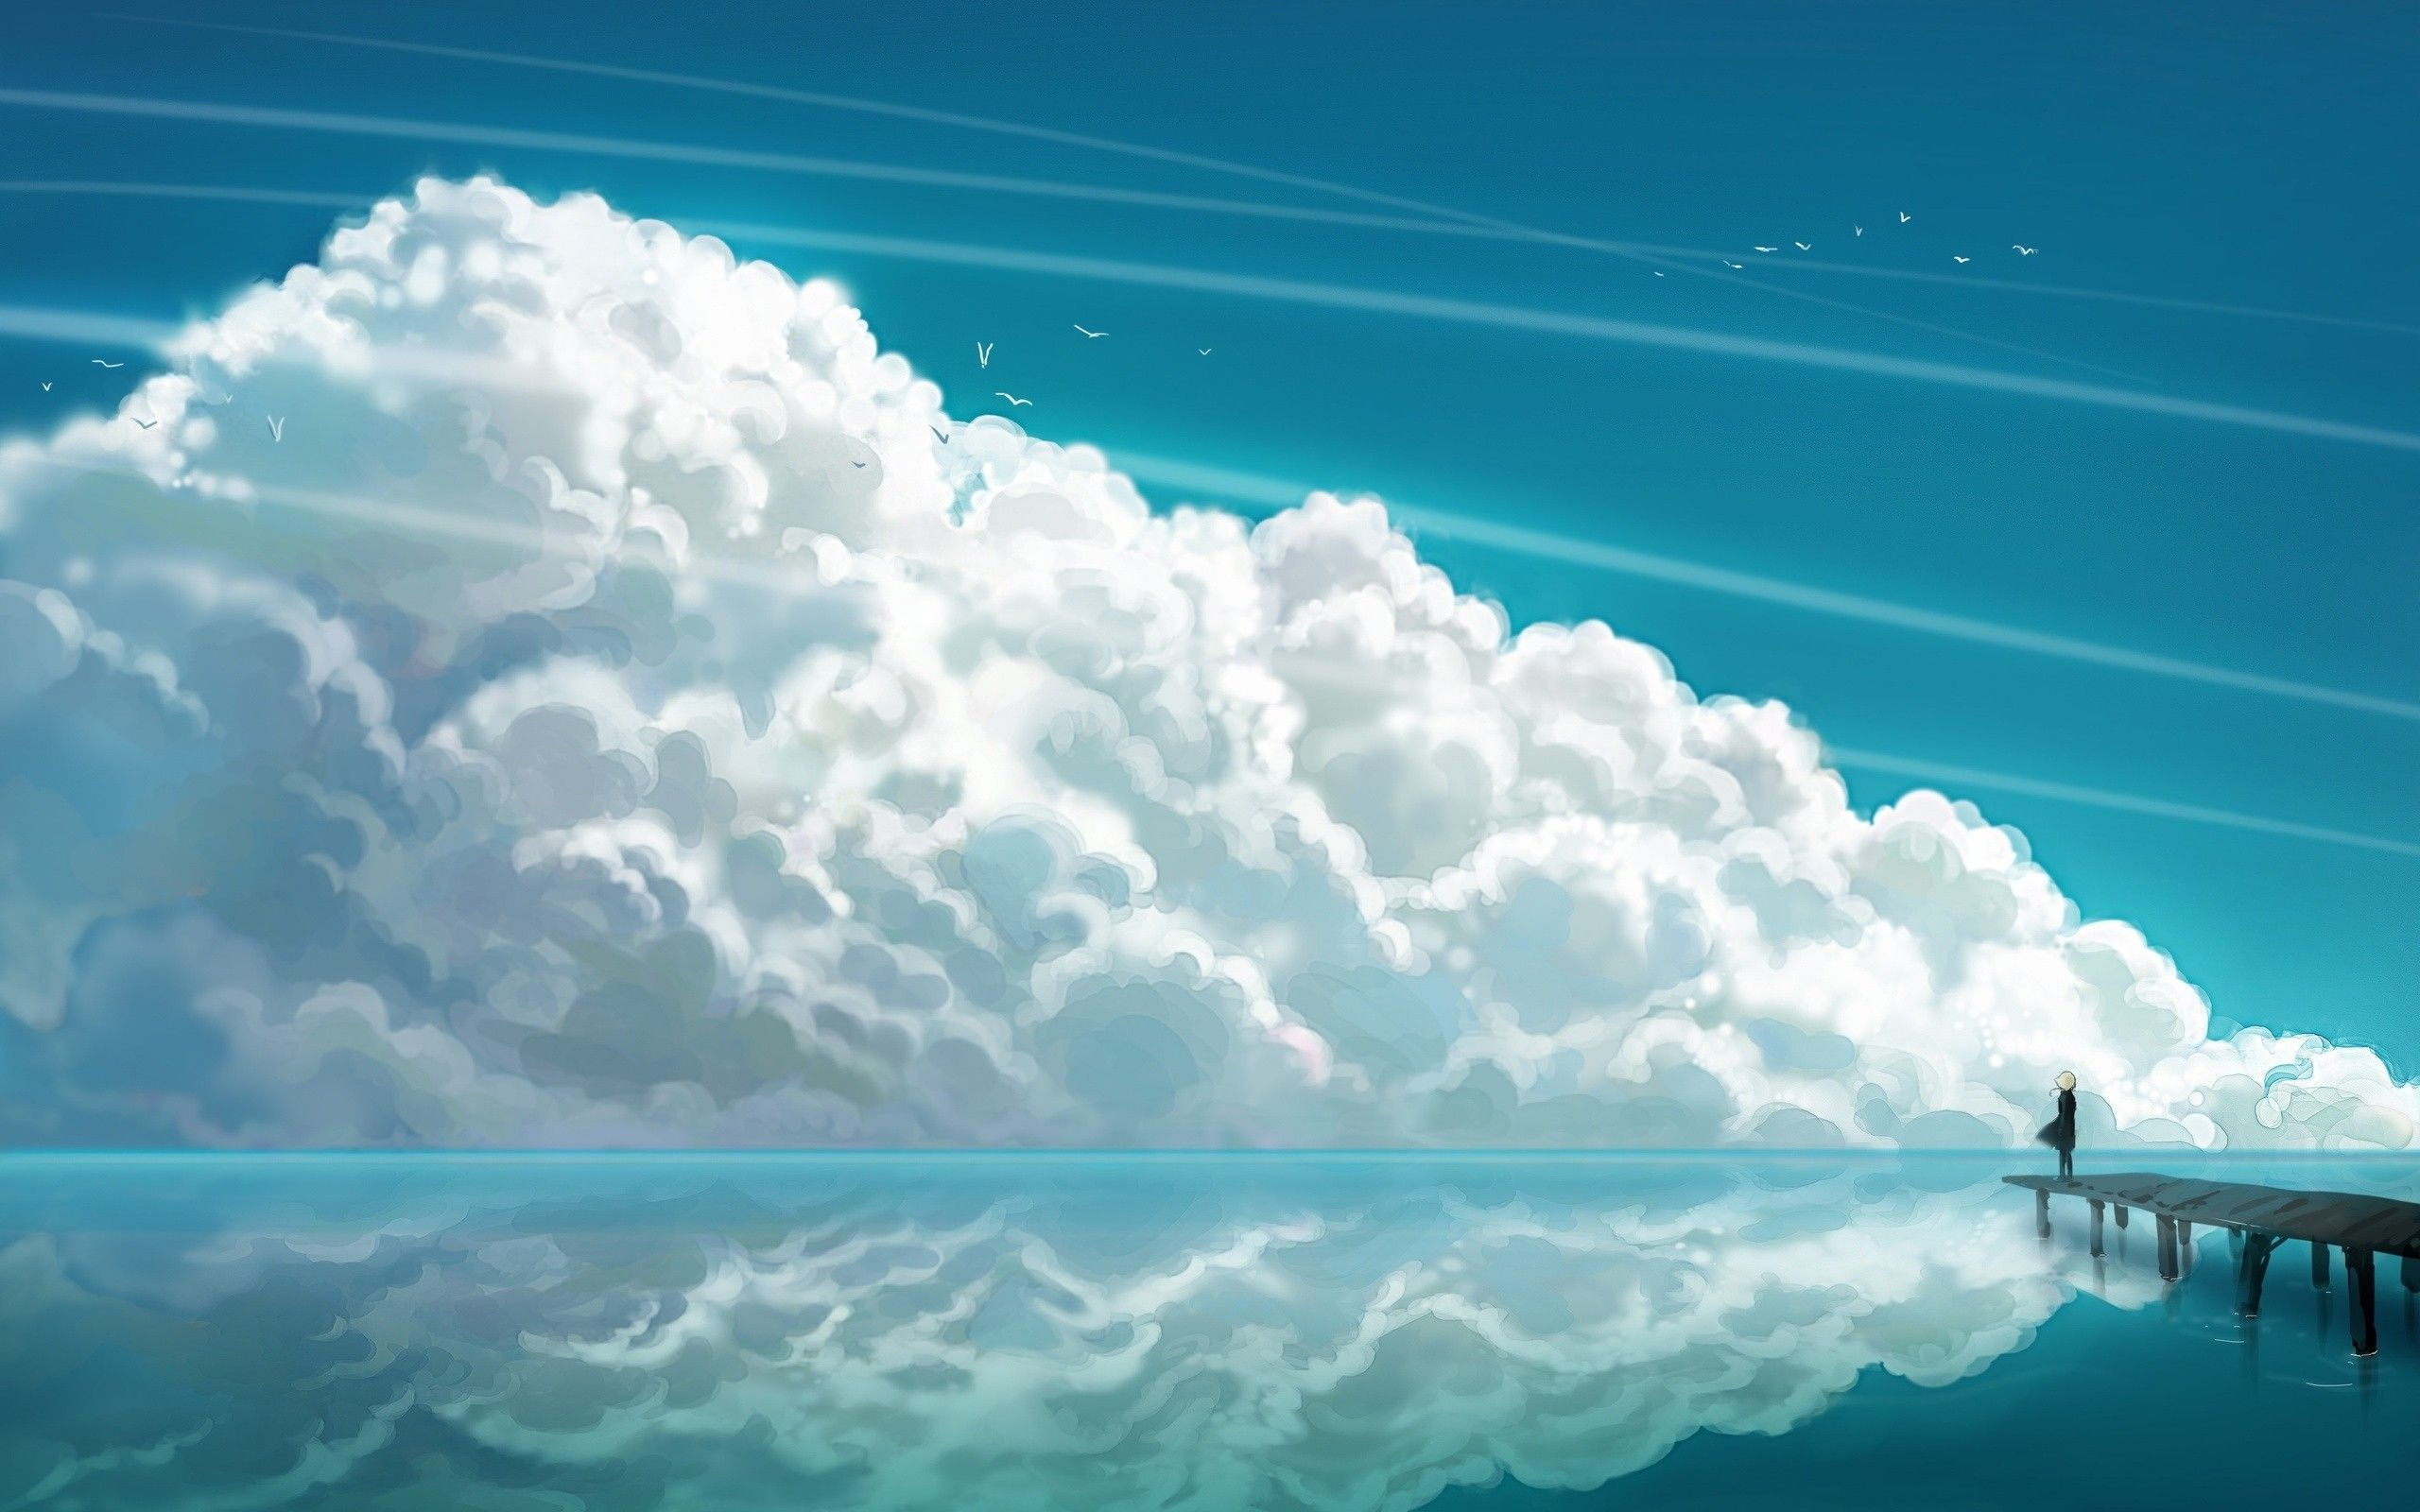 Anime Clouds Wallpaper Anime Sky Wall Anime Scenery Wallpaper Clouds Scenery Wallpaper